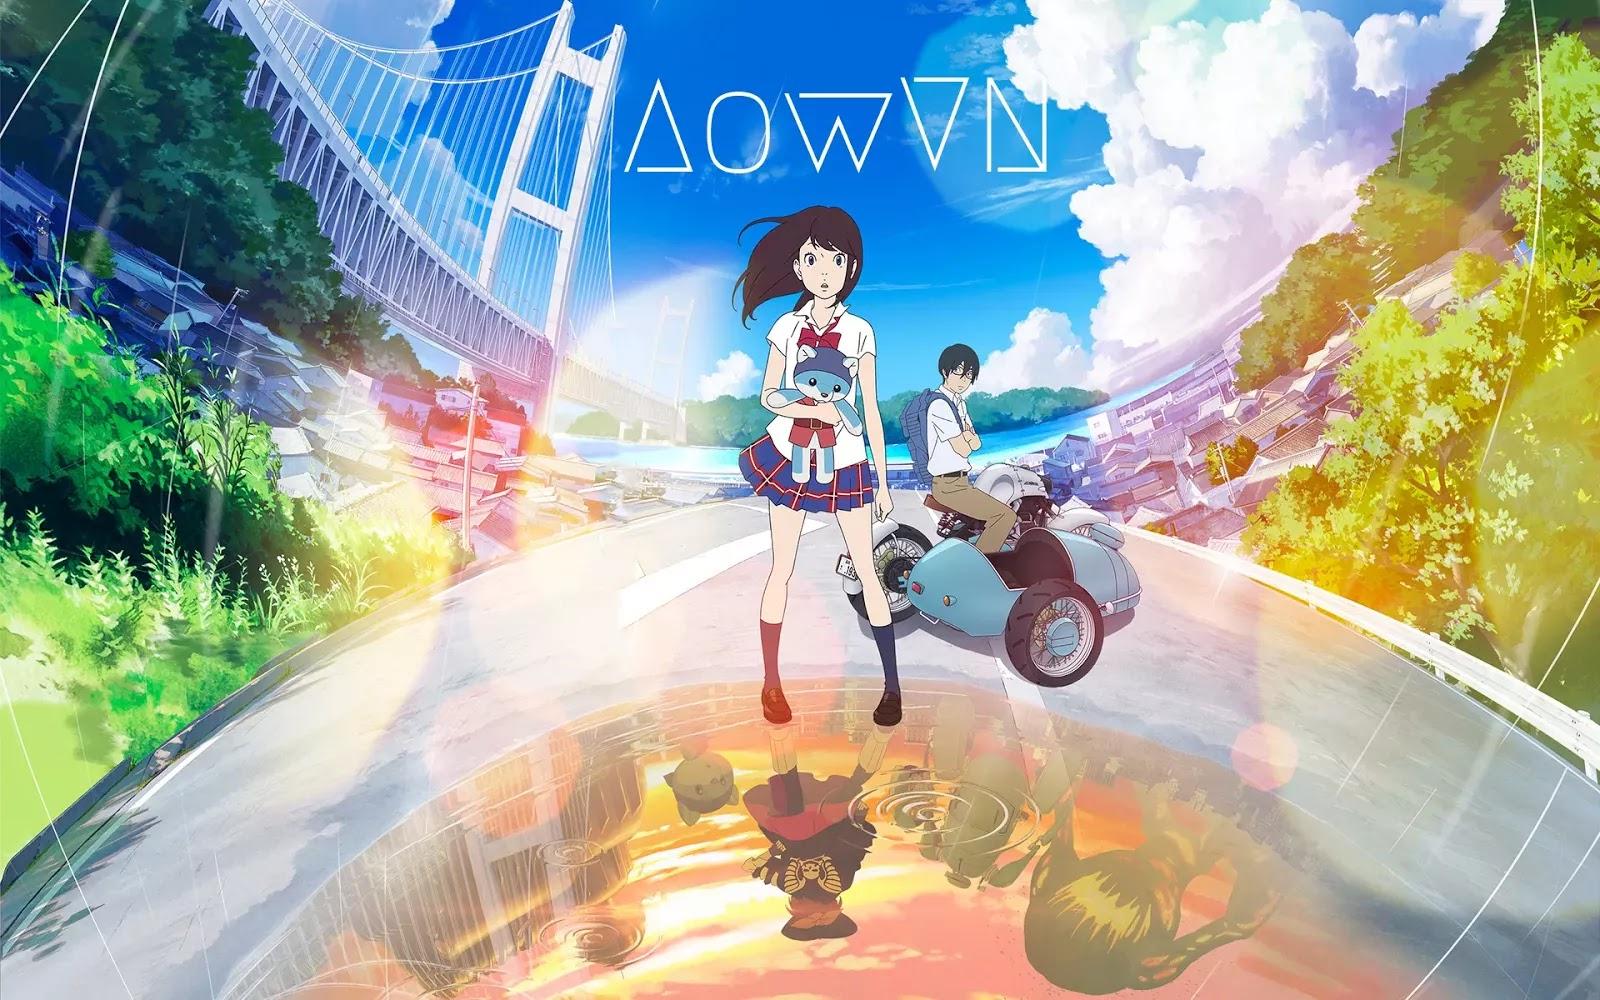 AowVN org - [ Anime 3gp Mp4 ] Hirune Hime: Shiranai Watashi no Monogatari HD | Movie Vietsub - Giải Mã Giấc Mơ